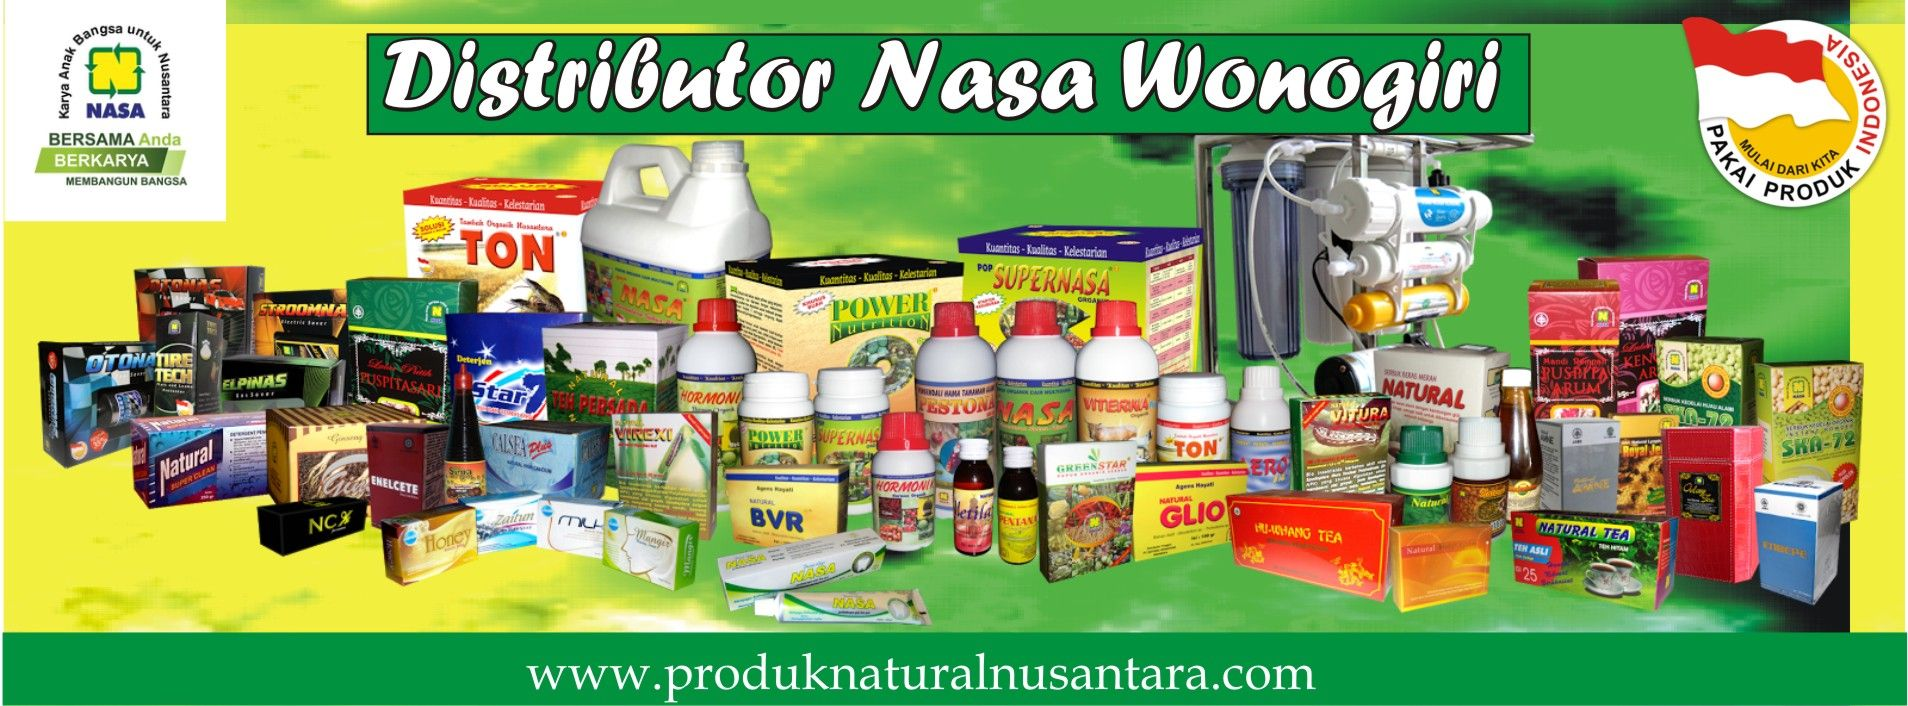 Distributor Nasa Wonogiri Stockist Penan Produk Di Agen